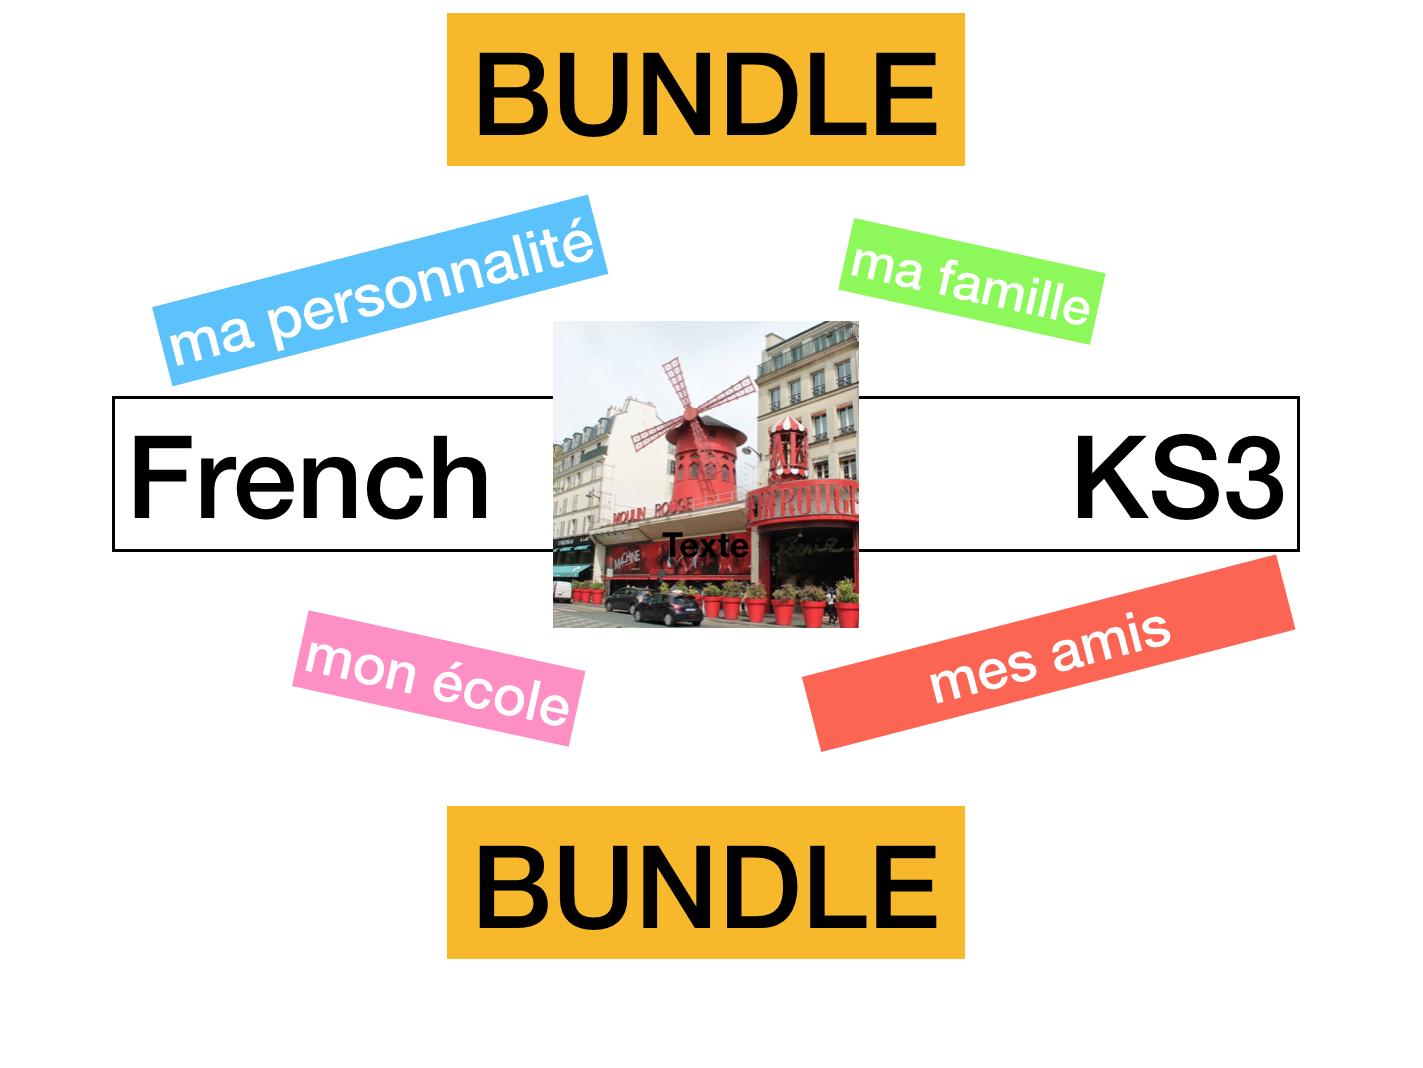 KS3 - French Allez 1 Mon monde perso (2.1 - 2.2 - 2.3 - 2.4)